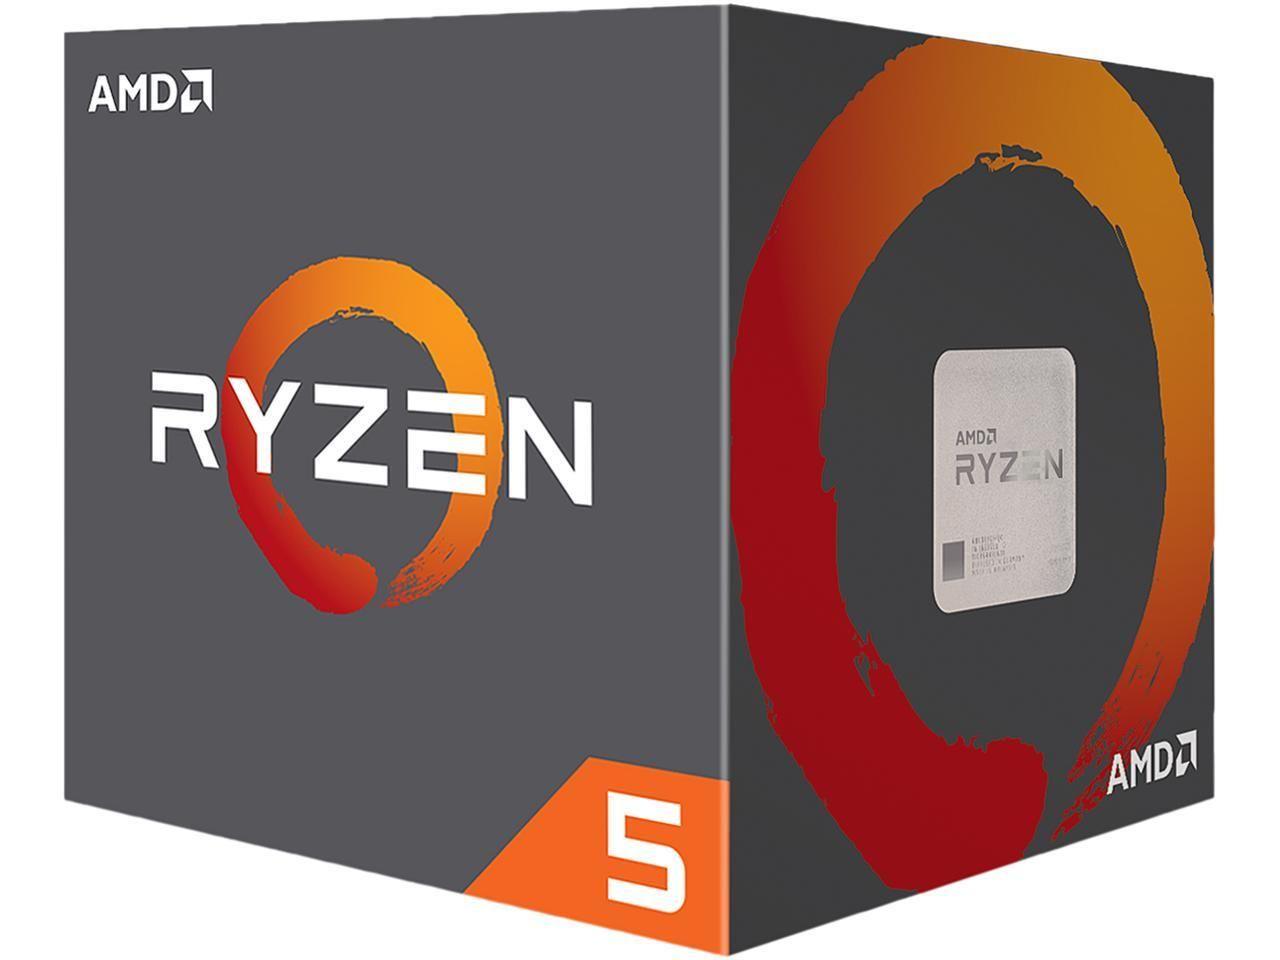 AMD Ryzen 5 2600 processor 3.4ghz - £118.38 Delivered @ Aria PC